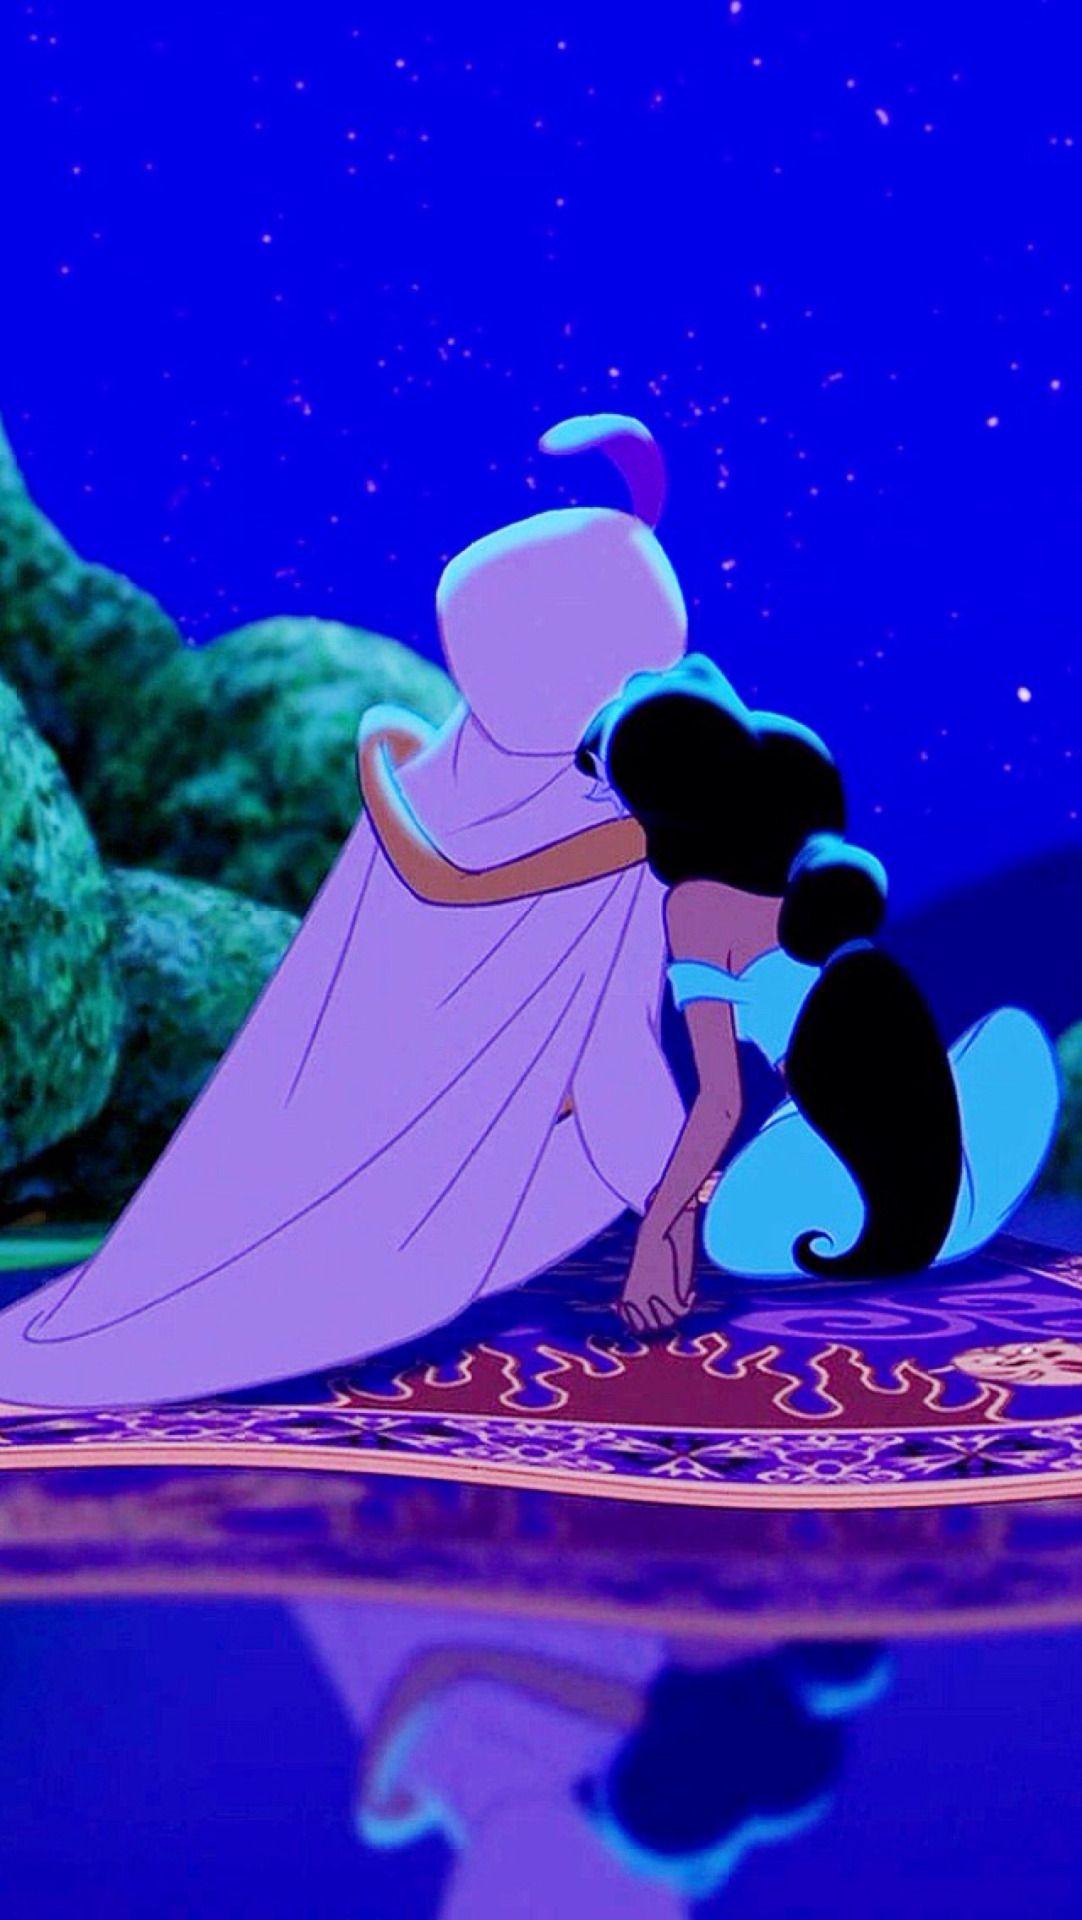 Disney S Aladdin Fondo De Pantalla Iphone Disney Fondos De